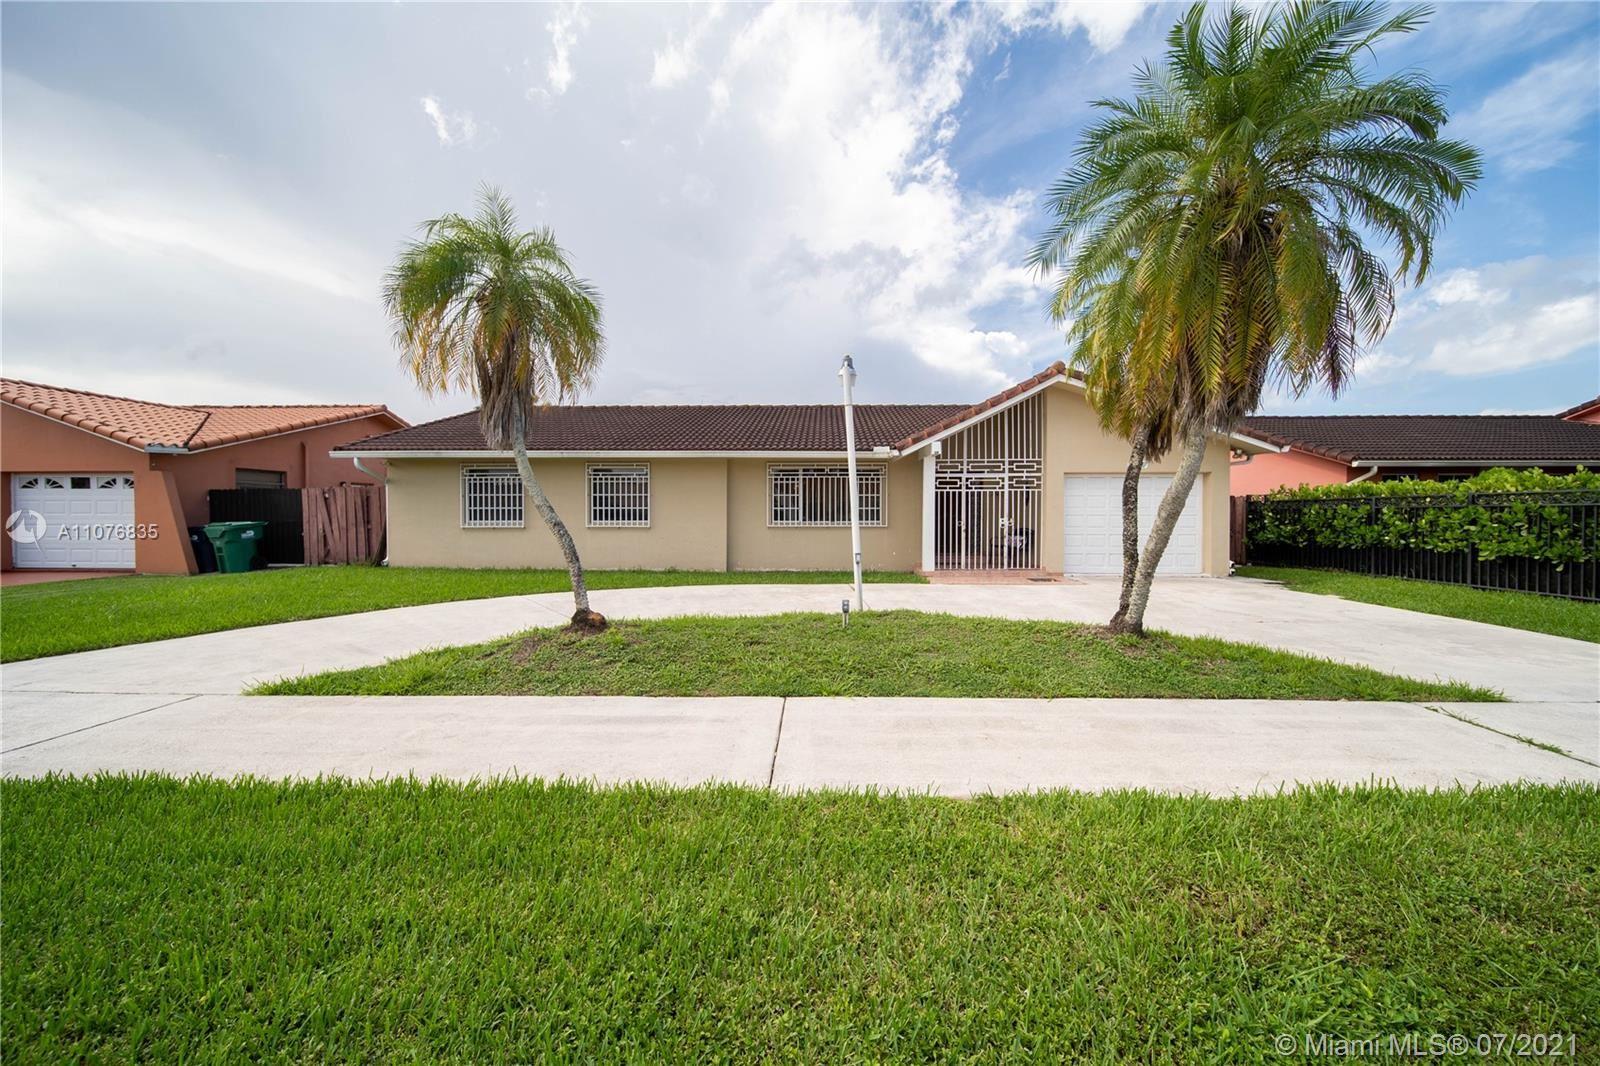 Photo of 14031 SW 40th Ter, Miami, FL 33175 (MLS # A11076835)